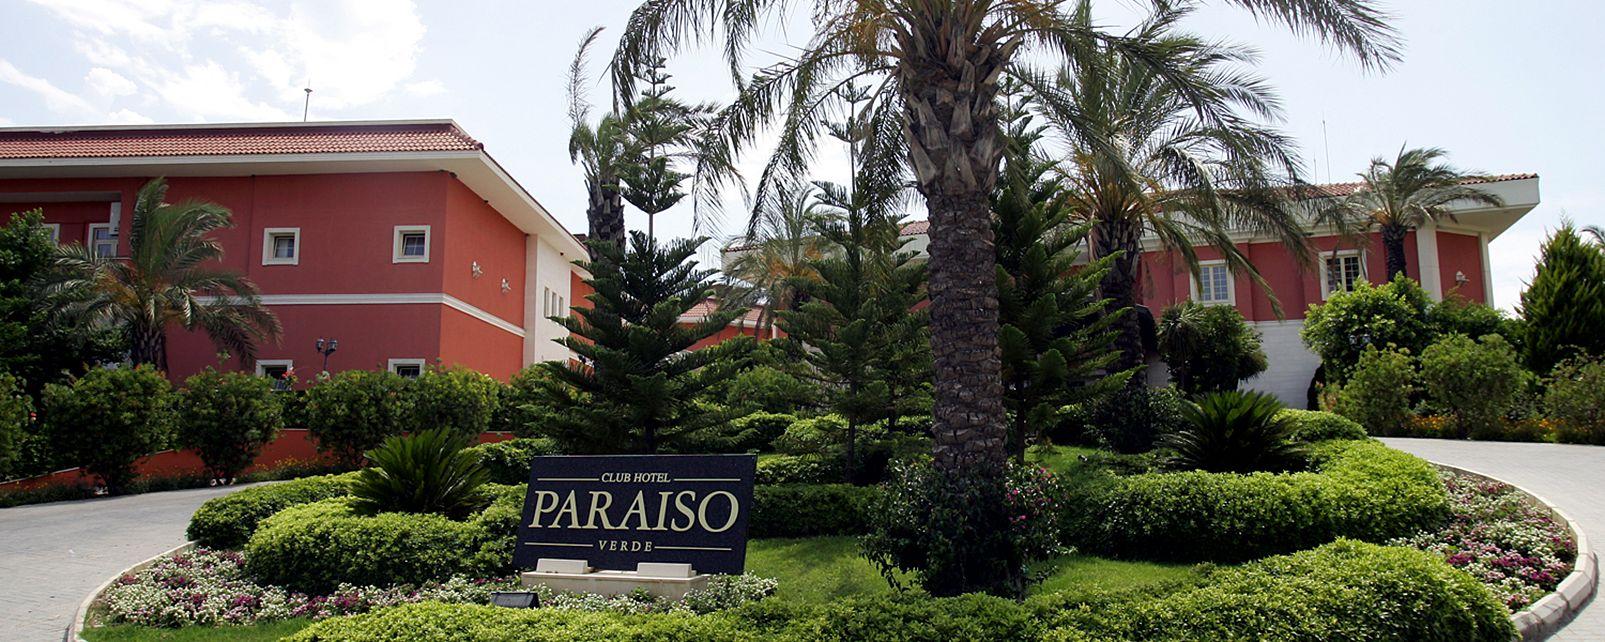 Hotel Paraiso Verde